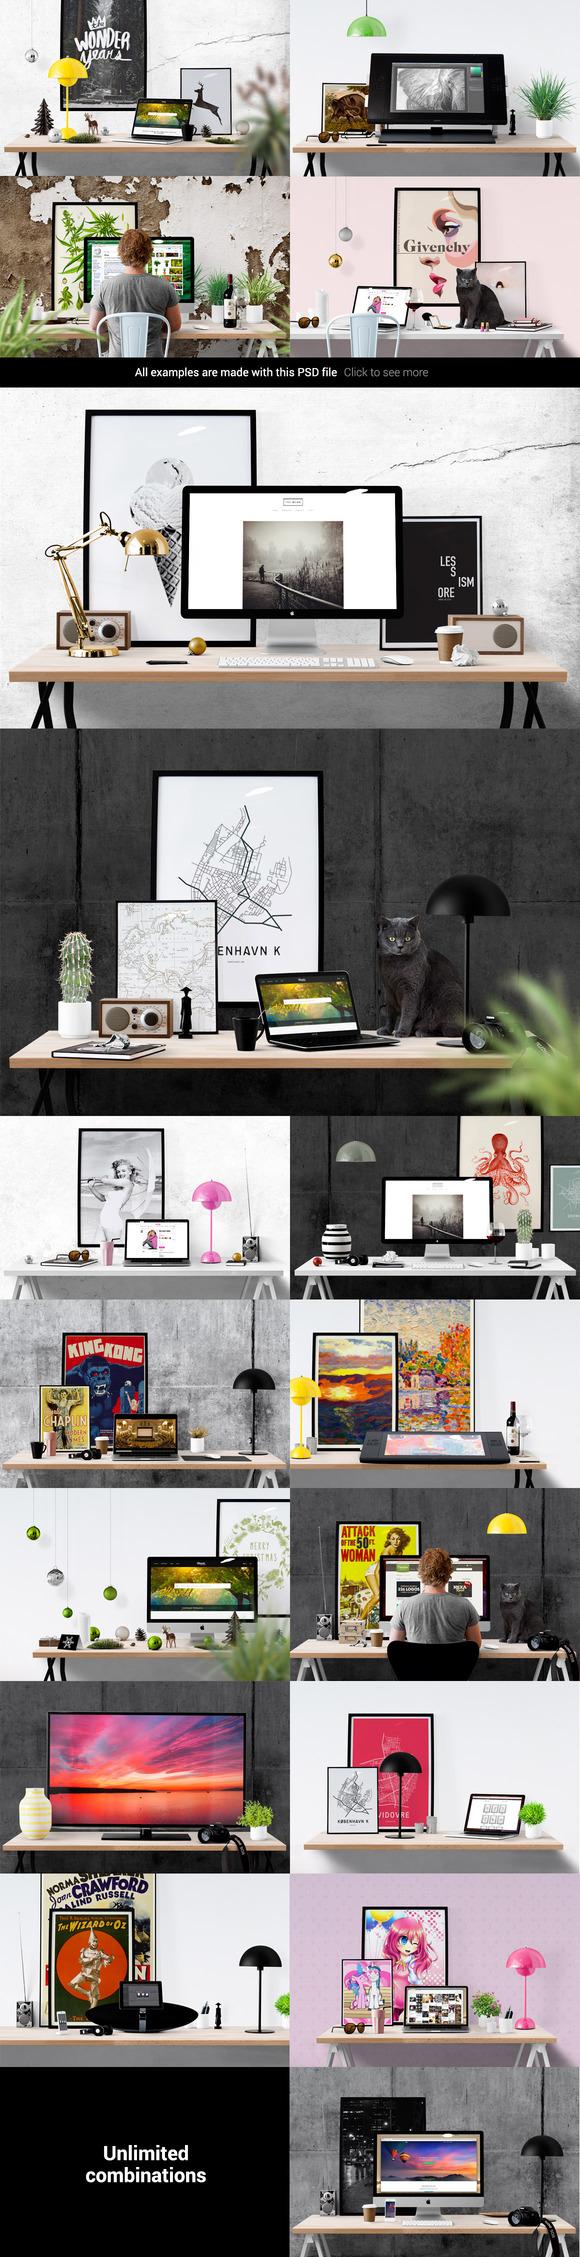 Poster design creator - Mockup Scene Creator Desk Use It For Your Etsy Presentation Header Images Product